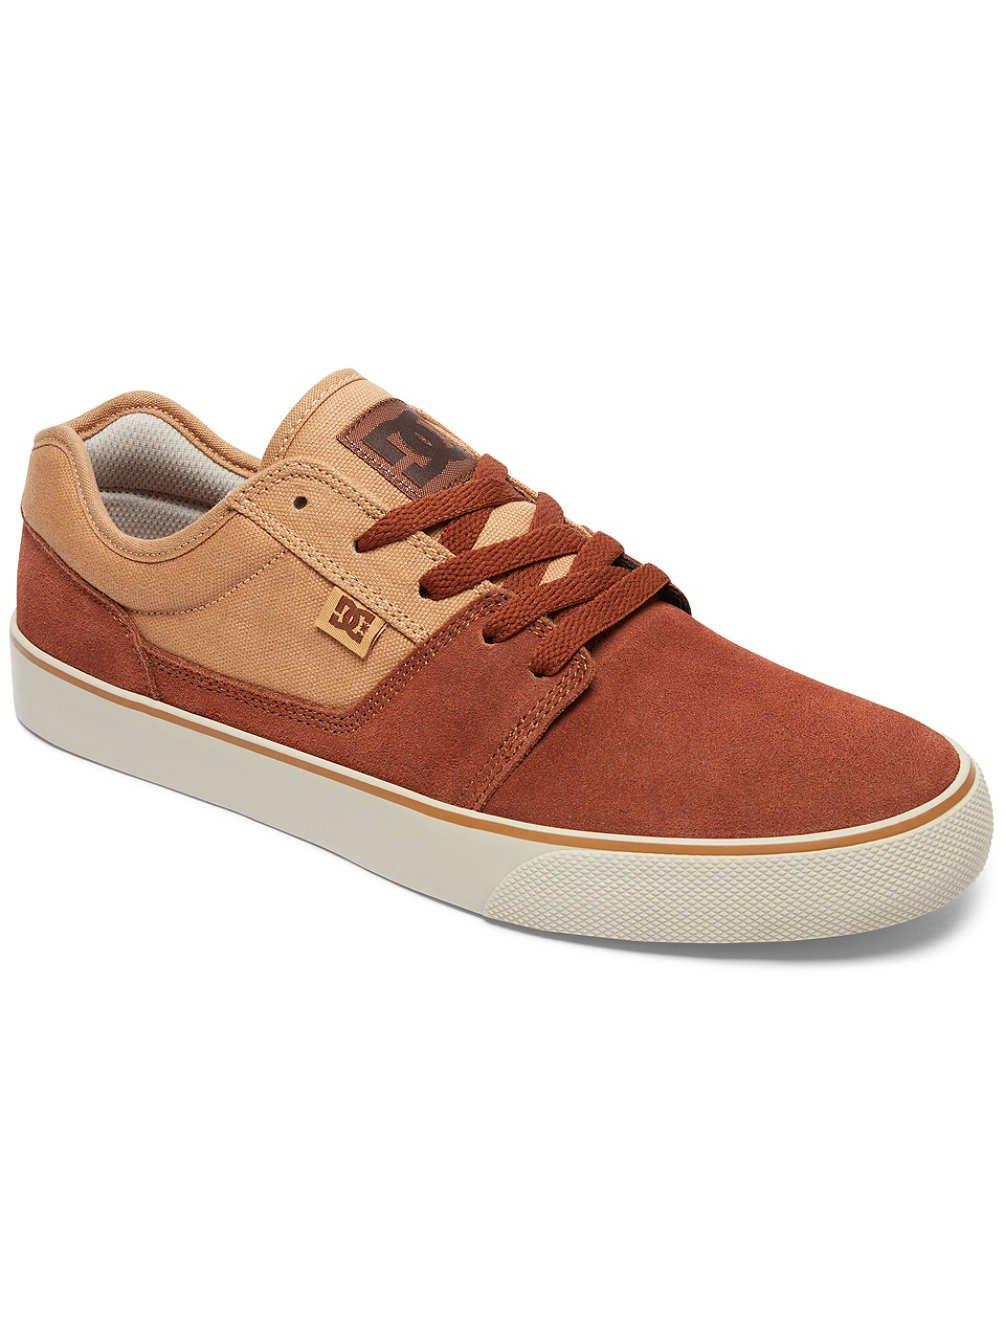 DC TONIK Unisex-Erwachsene Sneakers  10.5 Tobacco